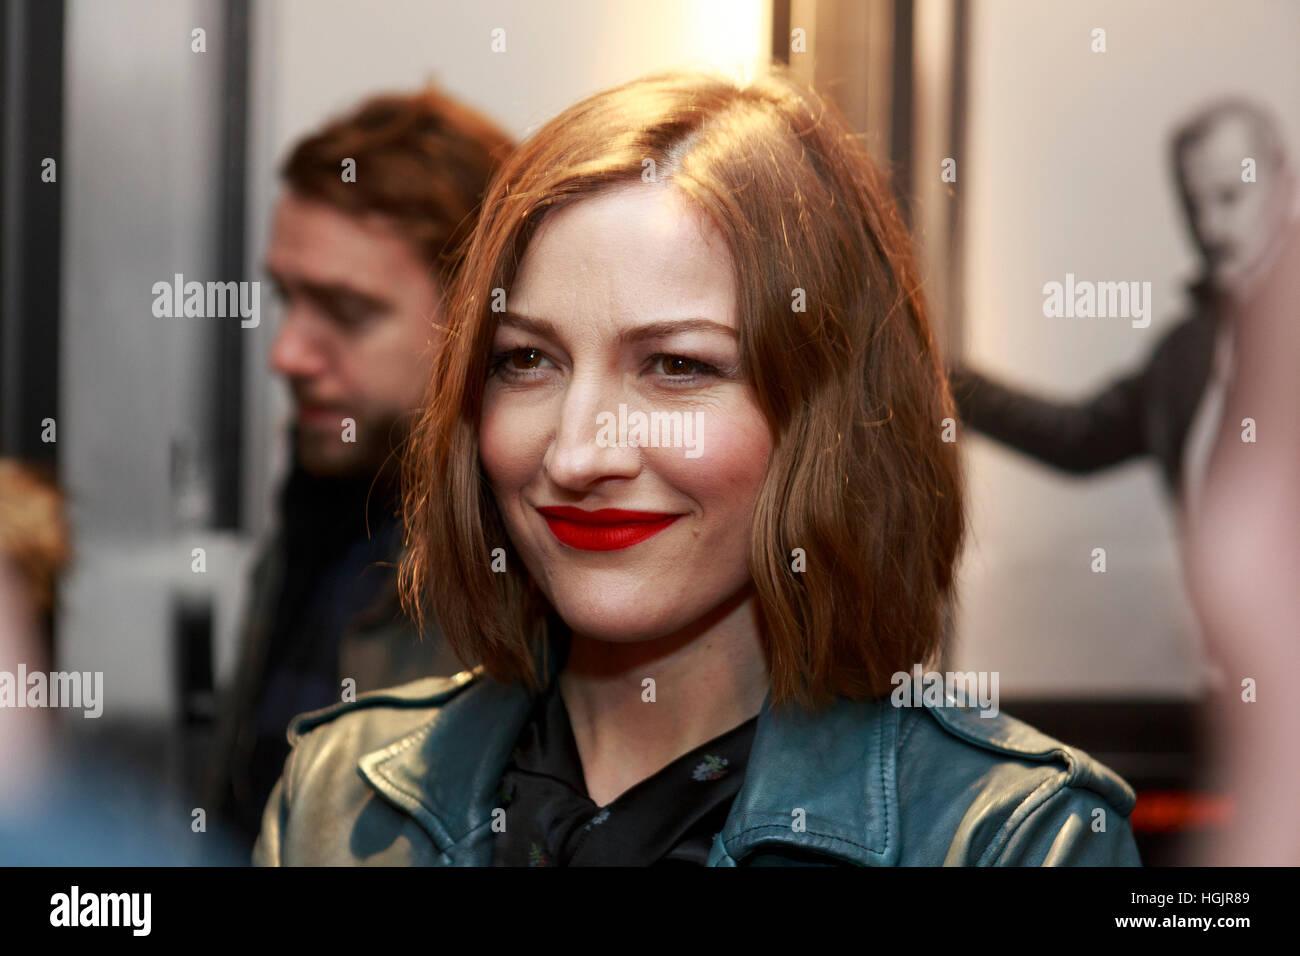 Edinburgh, UK. 22. Januar 2017. T2 Trainspotting Premiere beim Edinburgh Cineworld. Schottland. Abgebildete Kelly Stockfoto